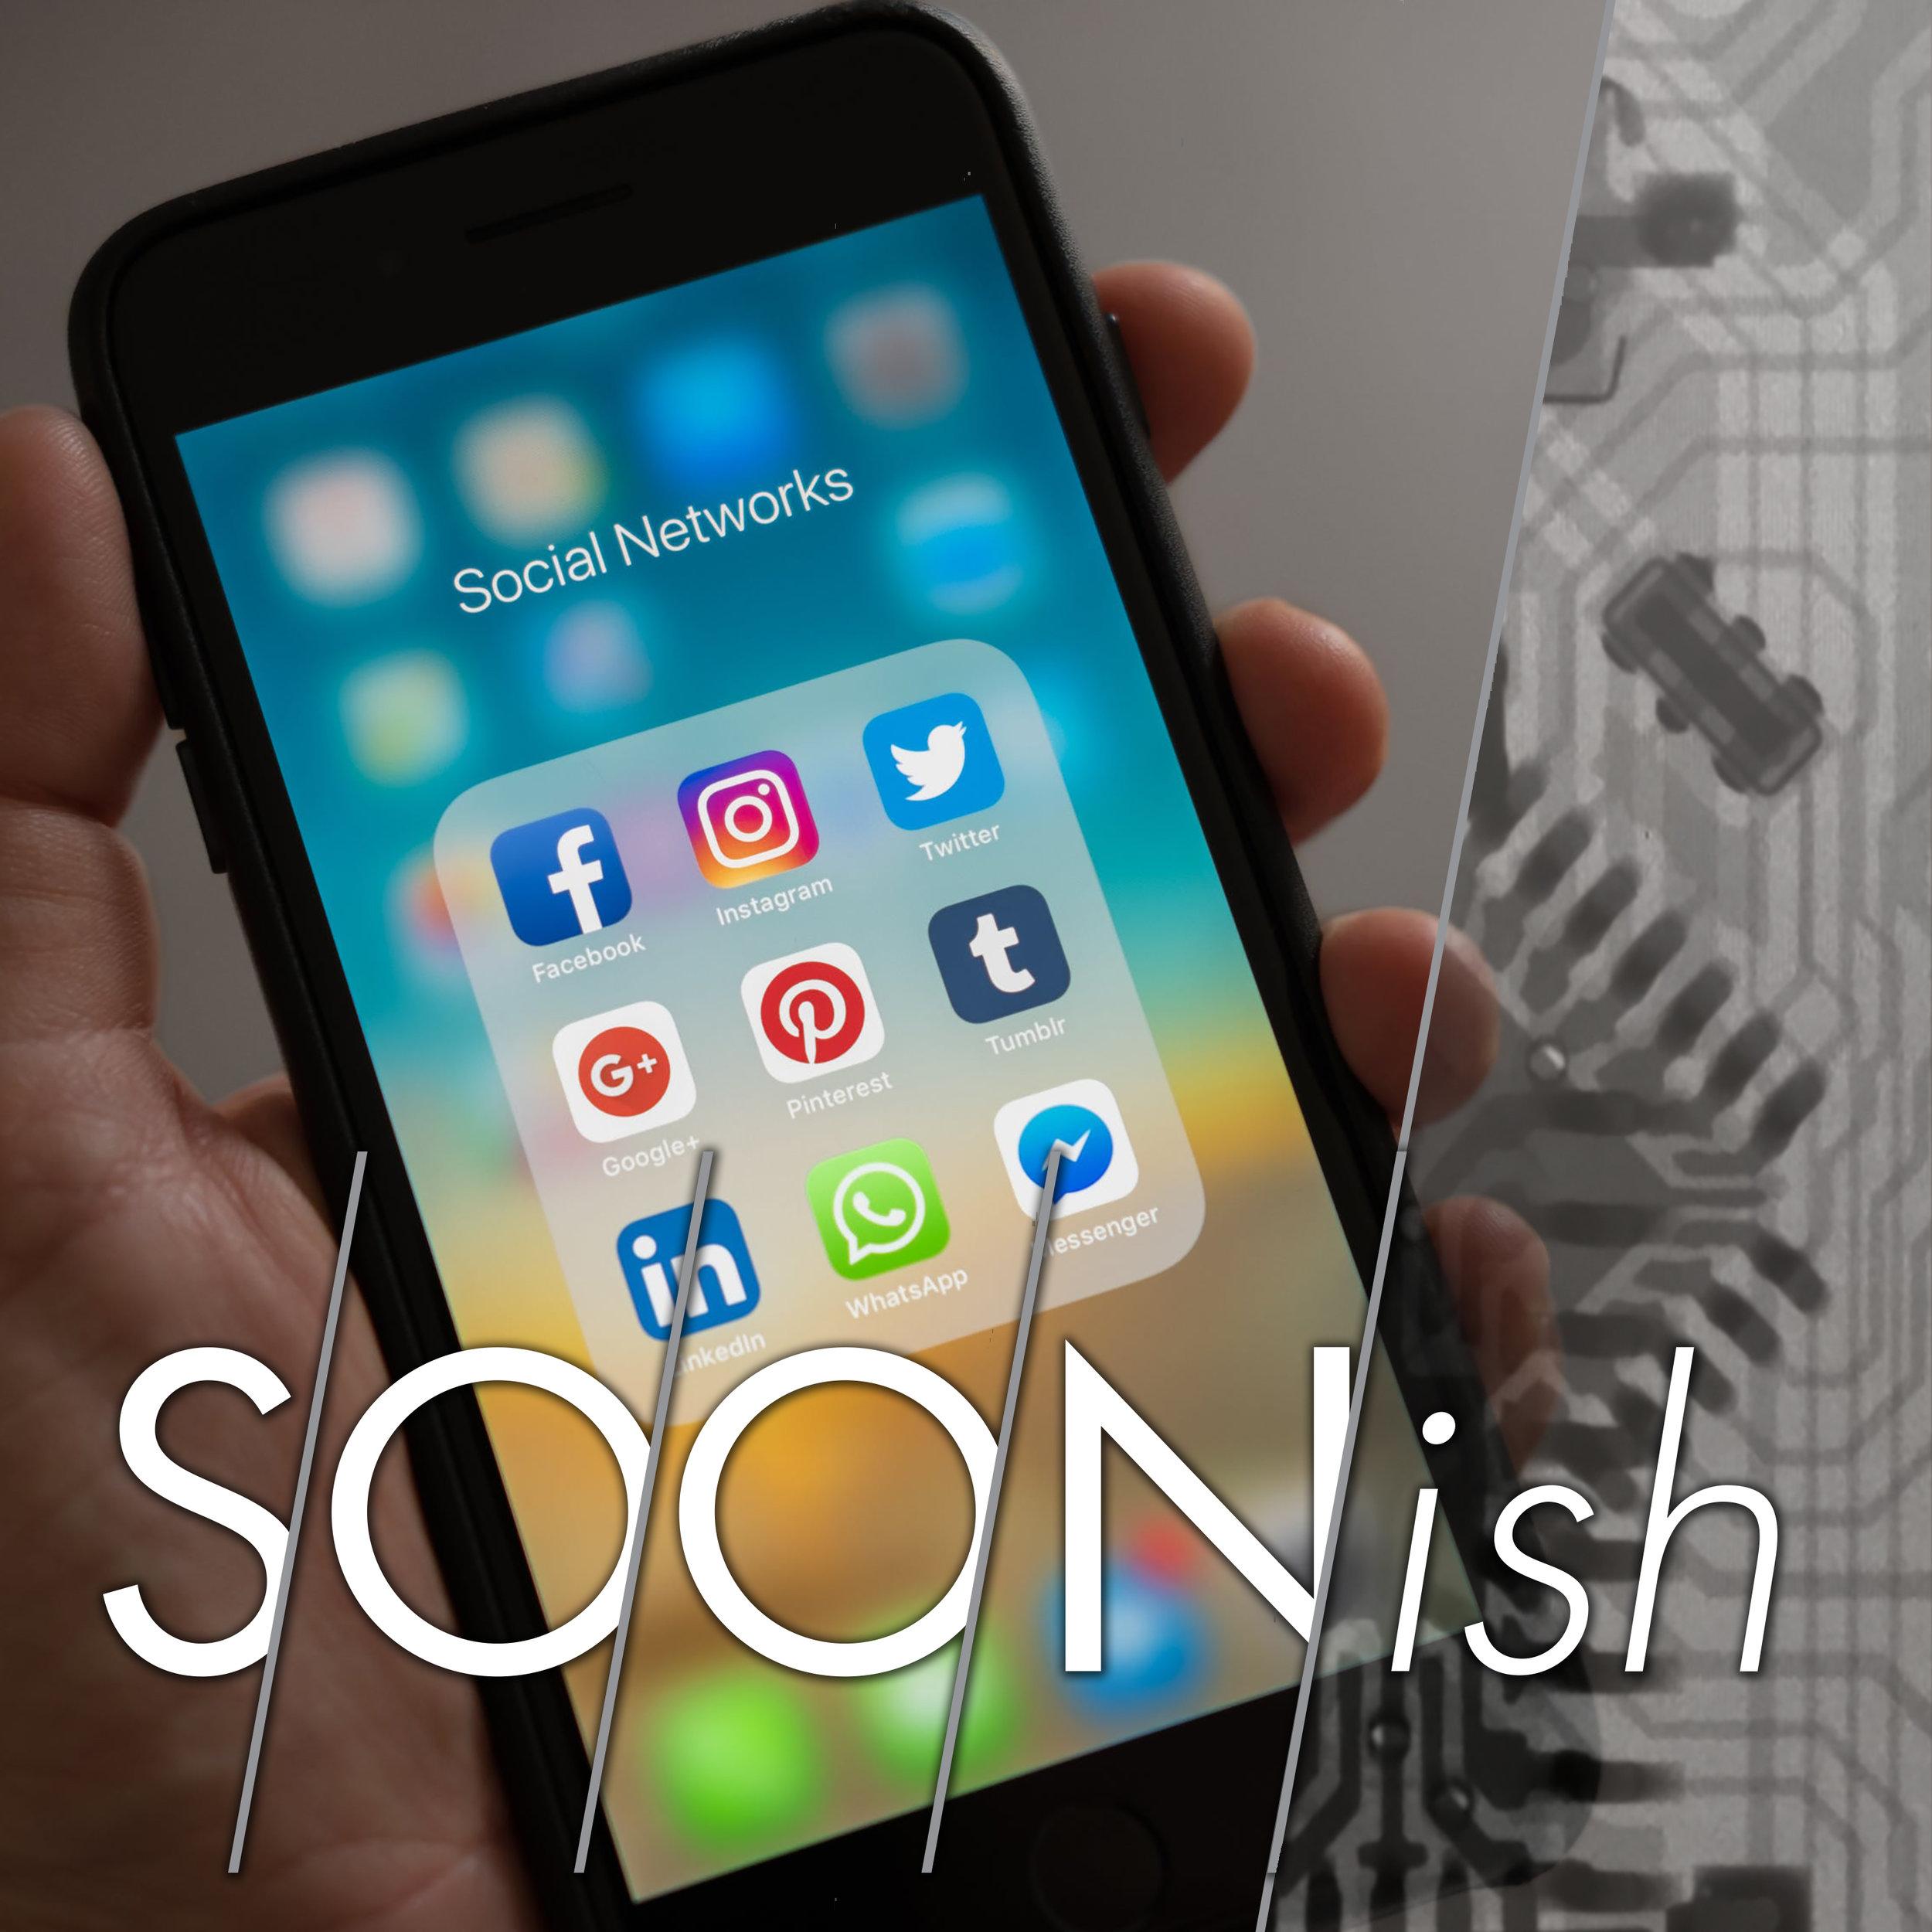 305-socialmedia-logo.jpg